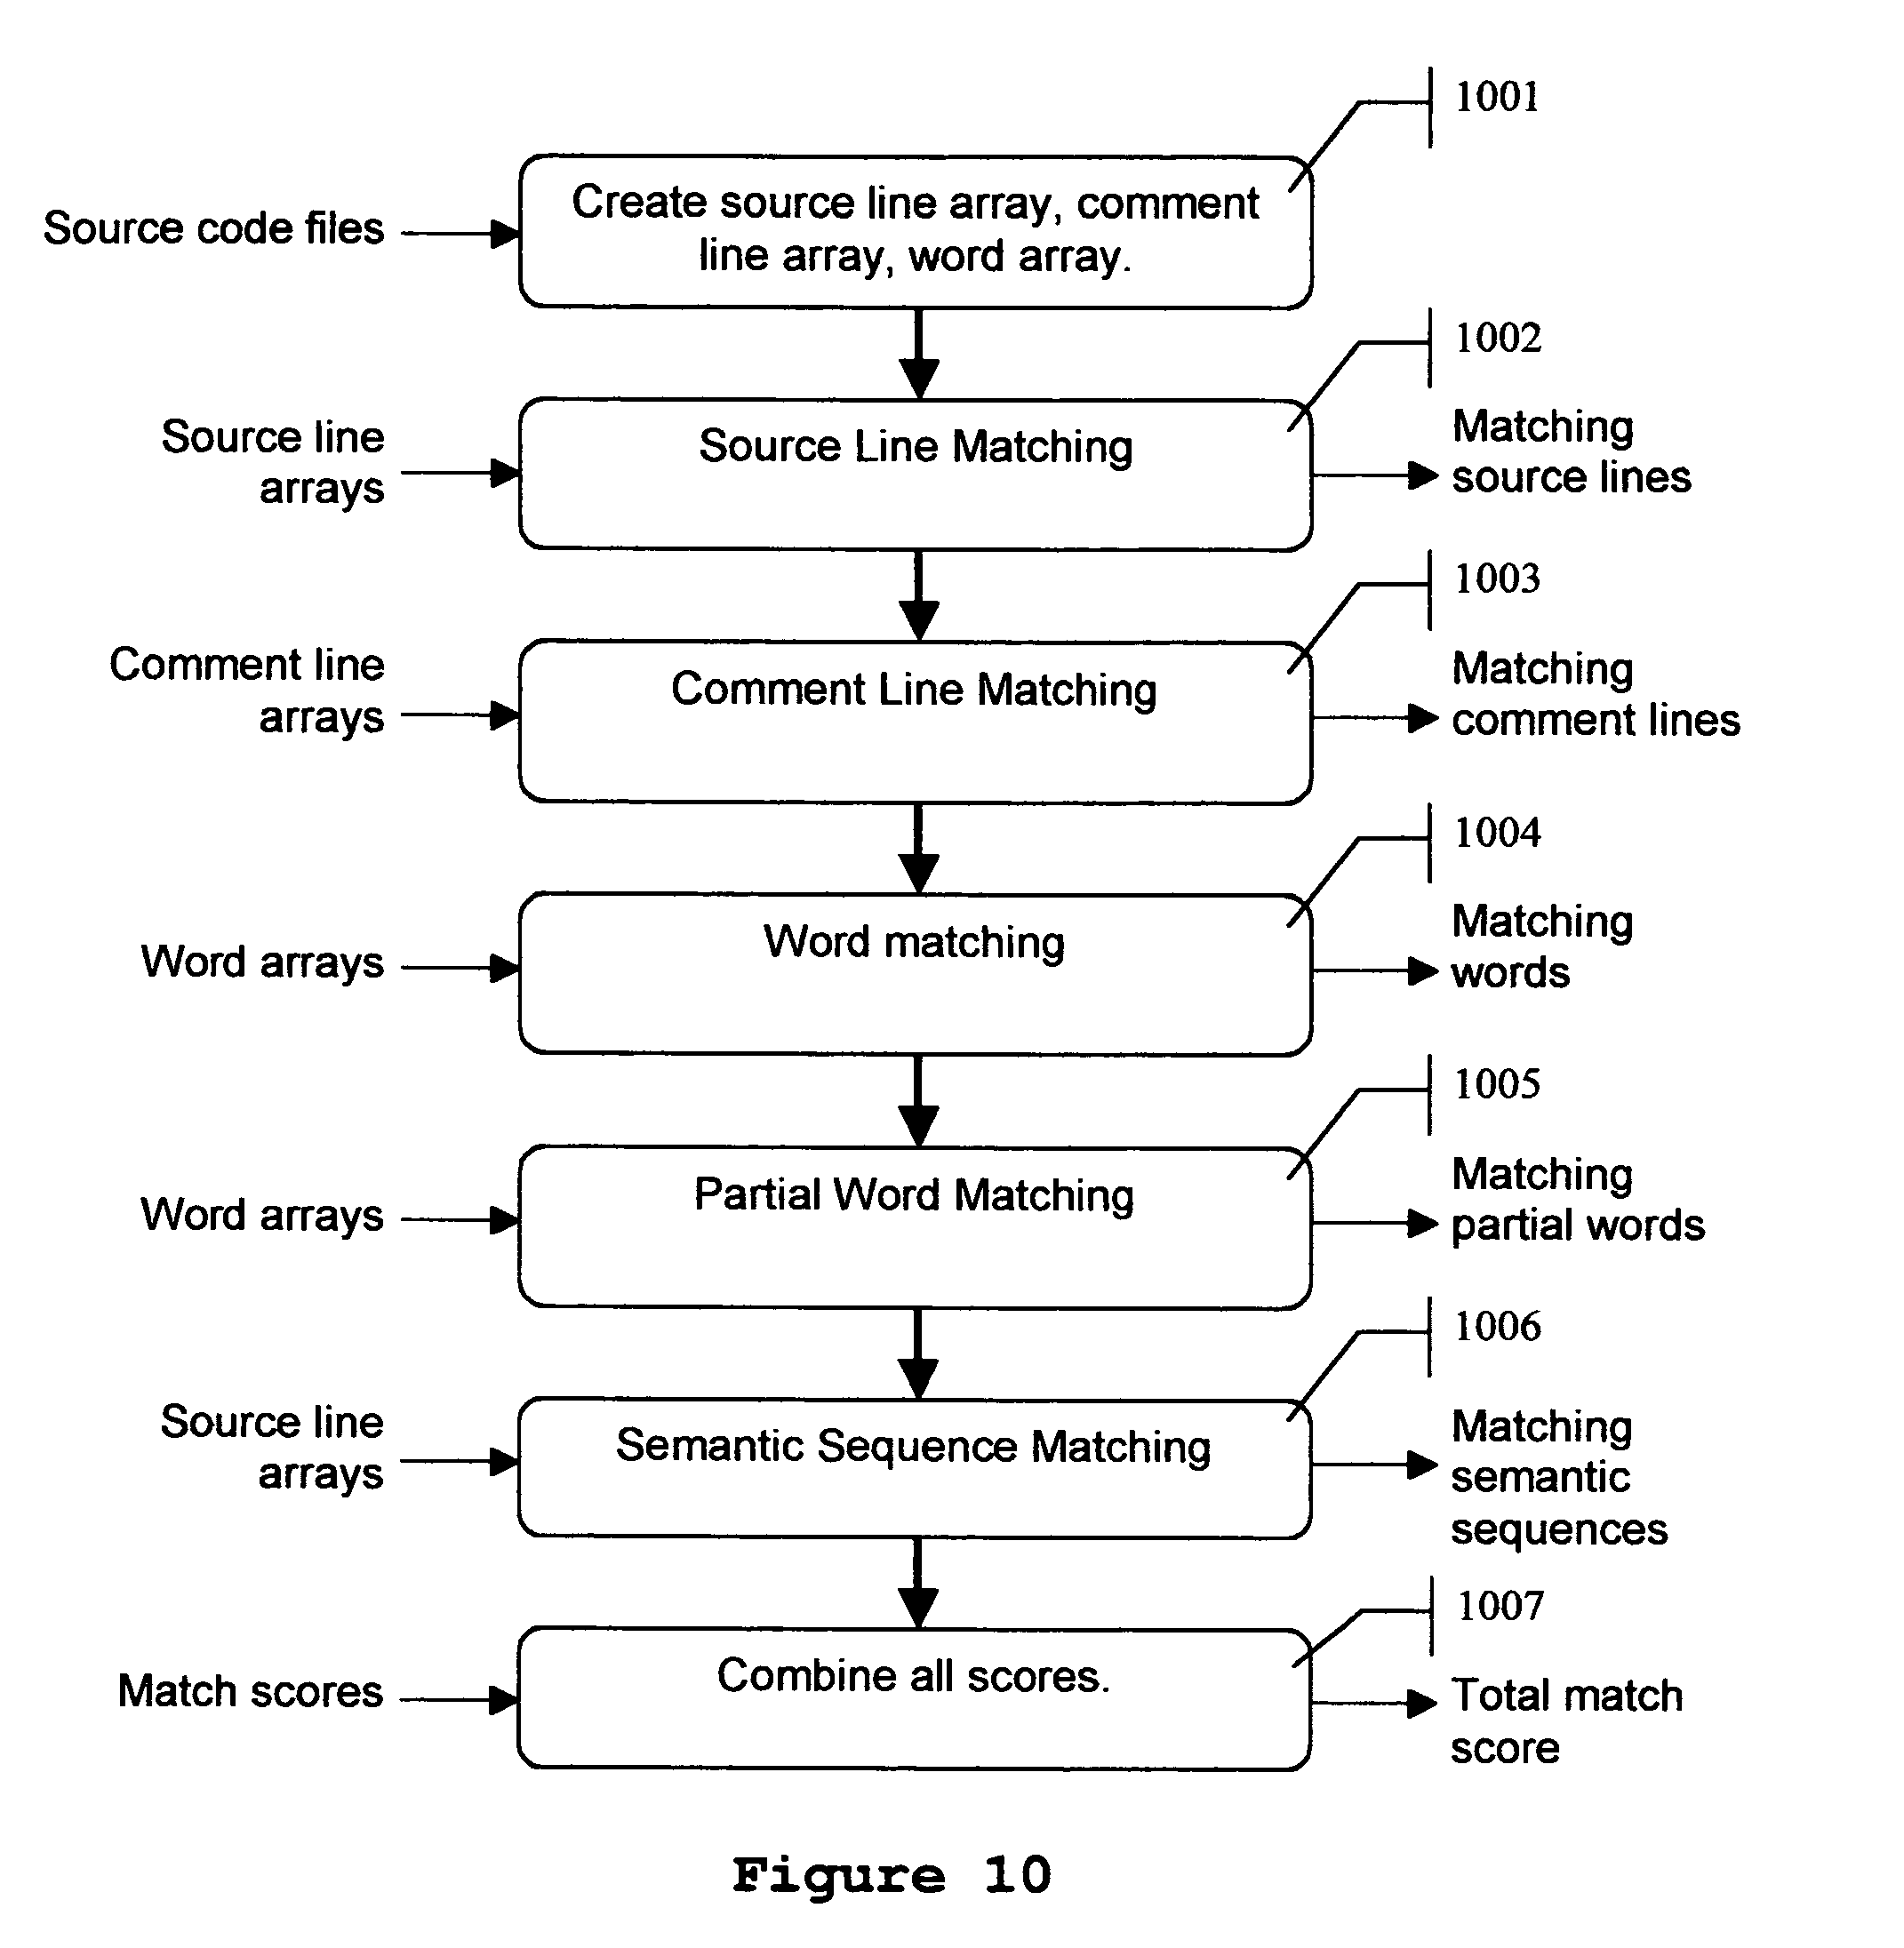 Dda Line Drawing Algorithm Source Code C : Word strings plagiarism mfawriting web fc